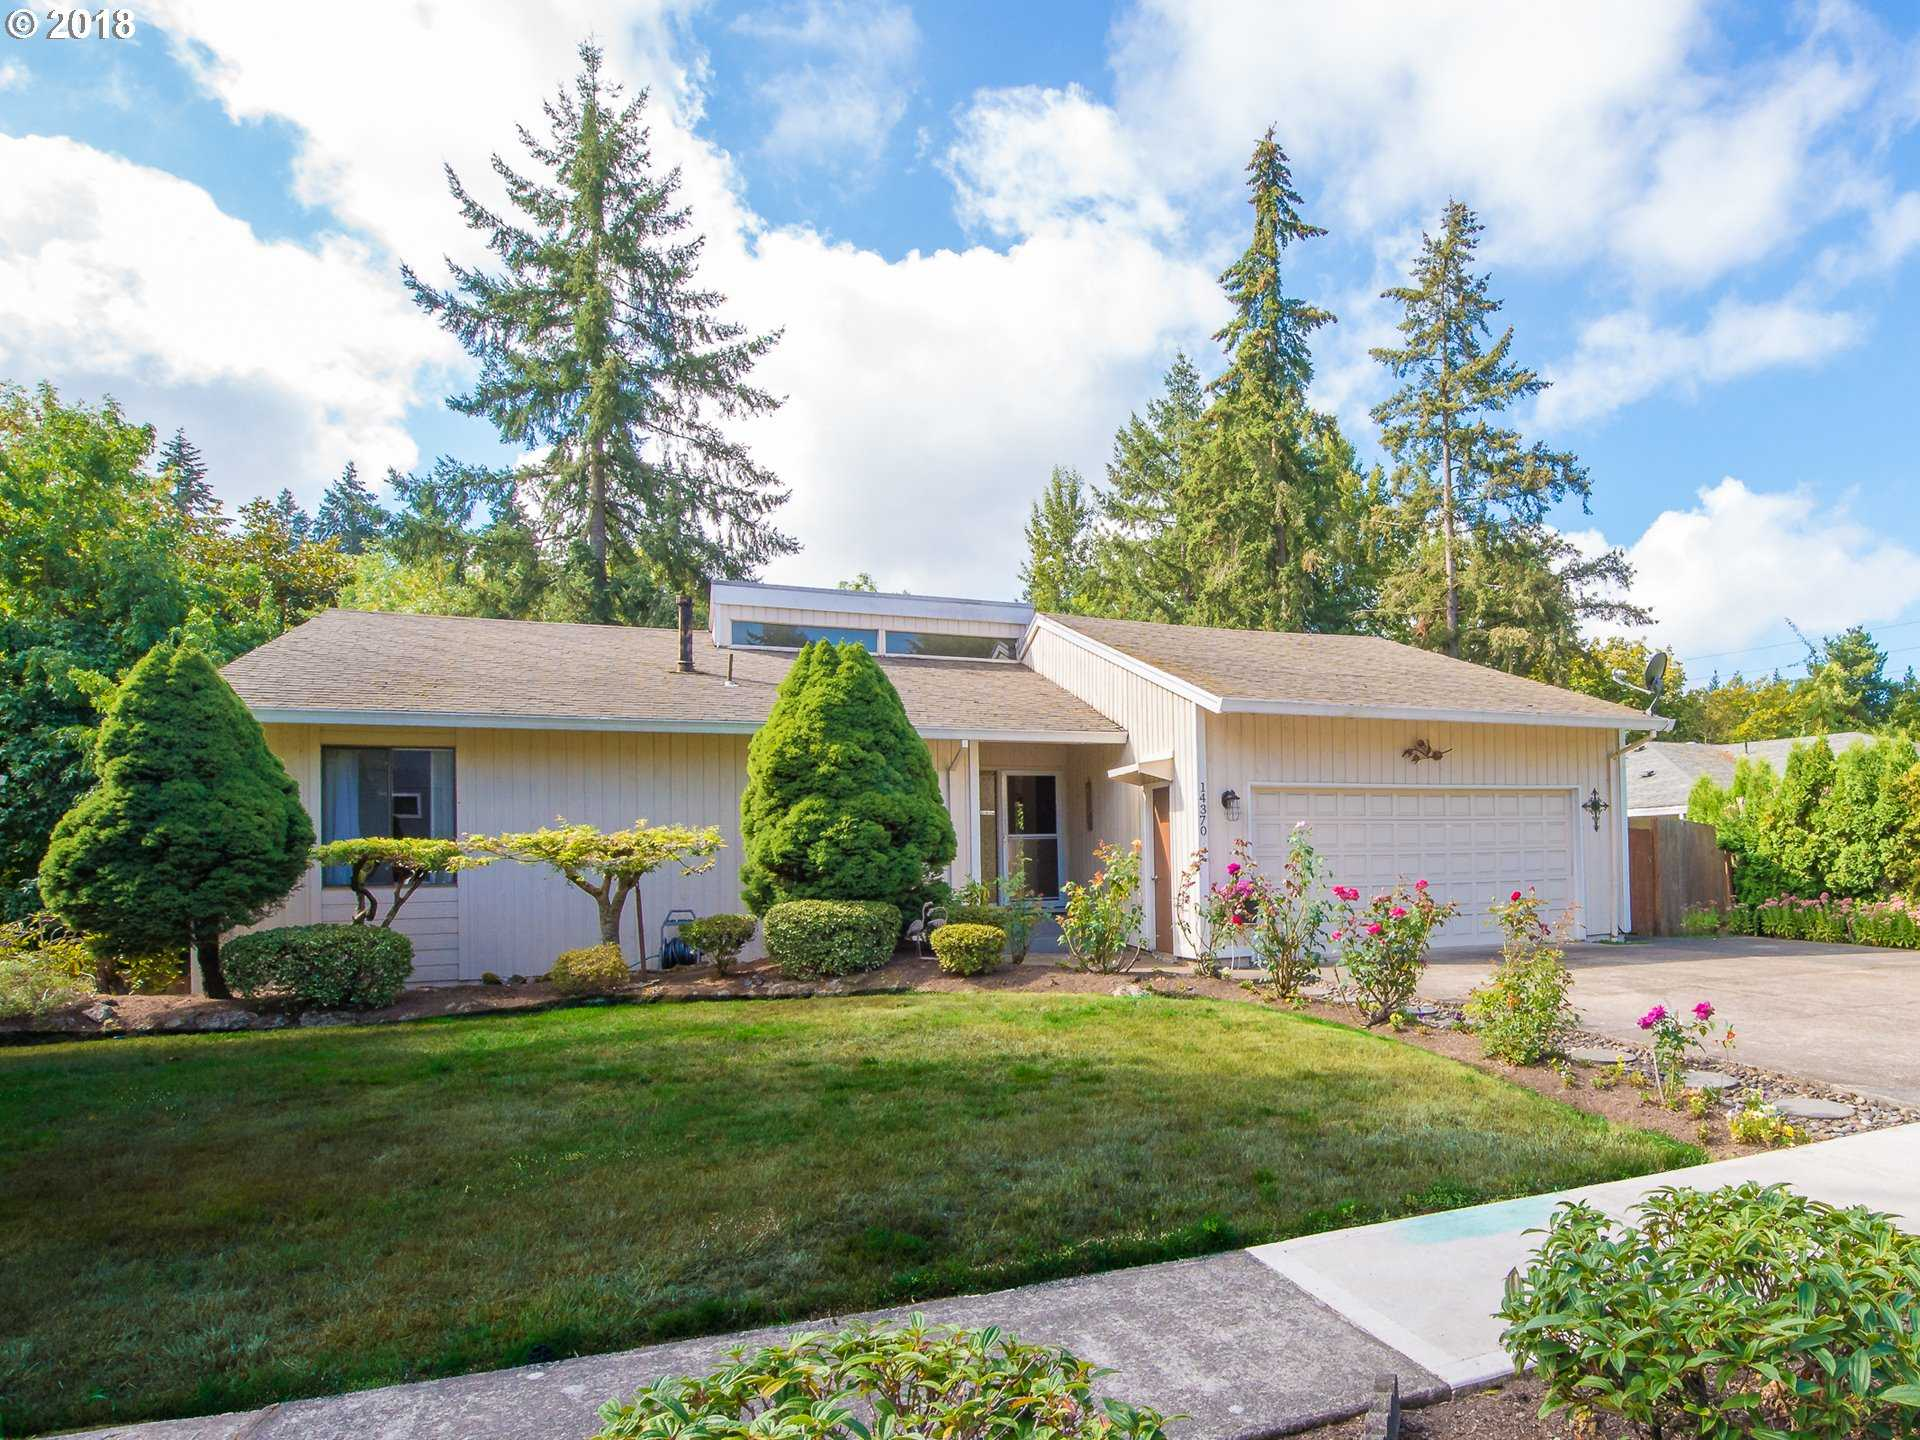 $499,000 - 5Br/3Ba -  for Sale in Highland, Beaverton